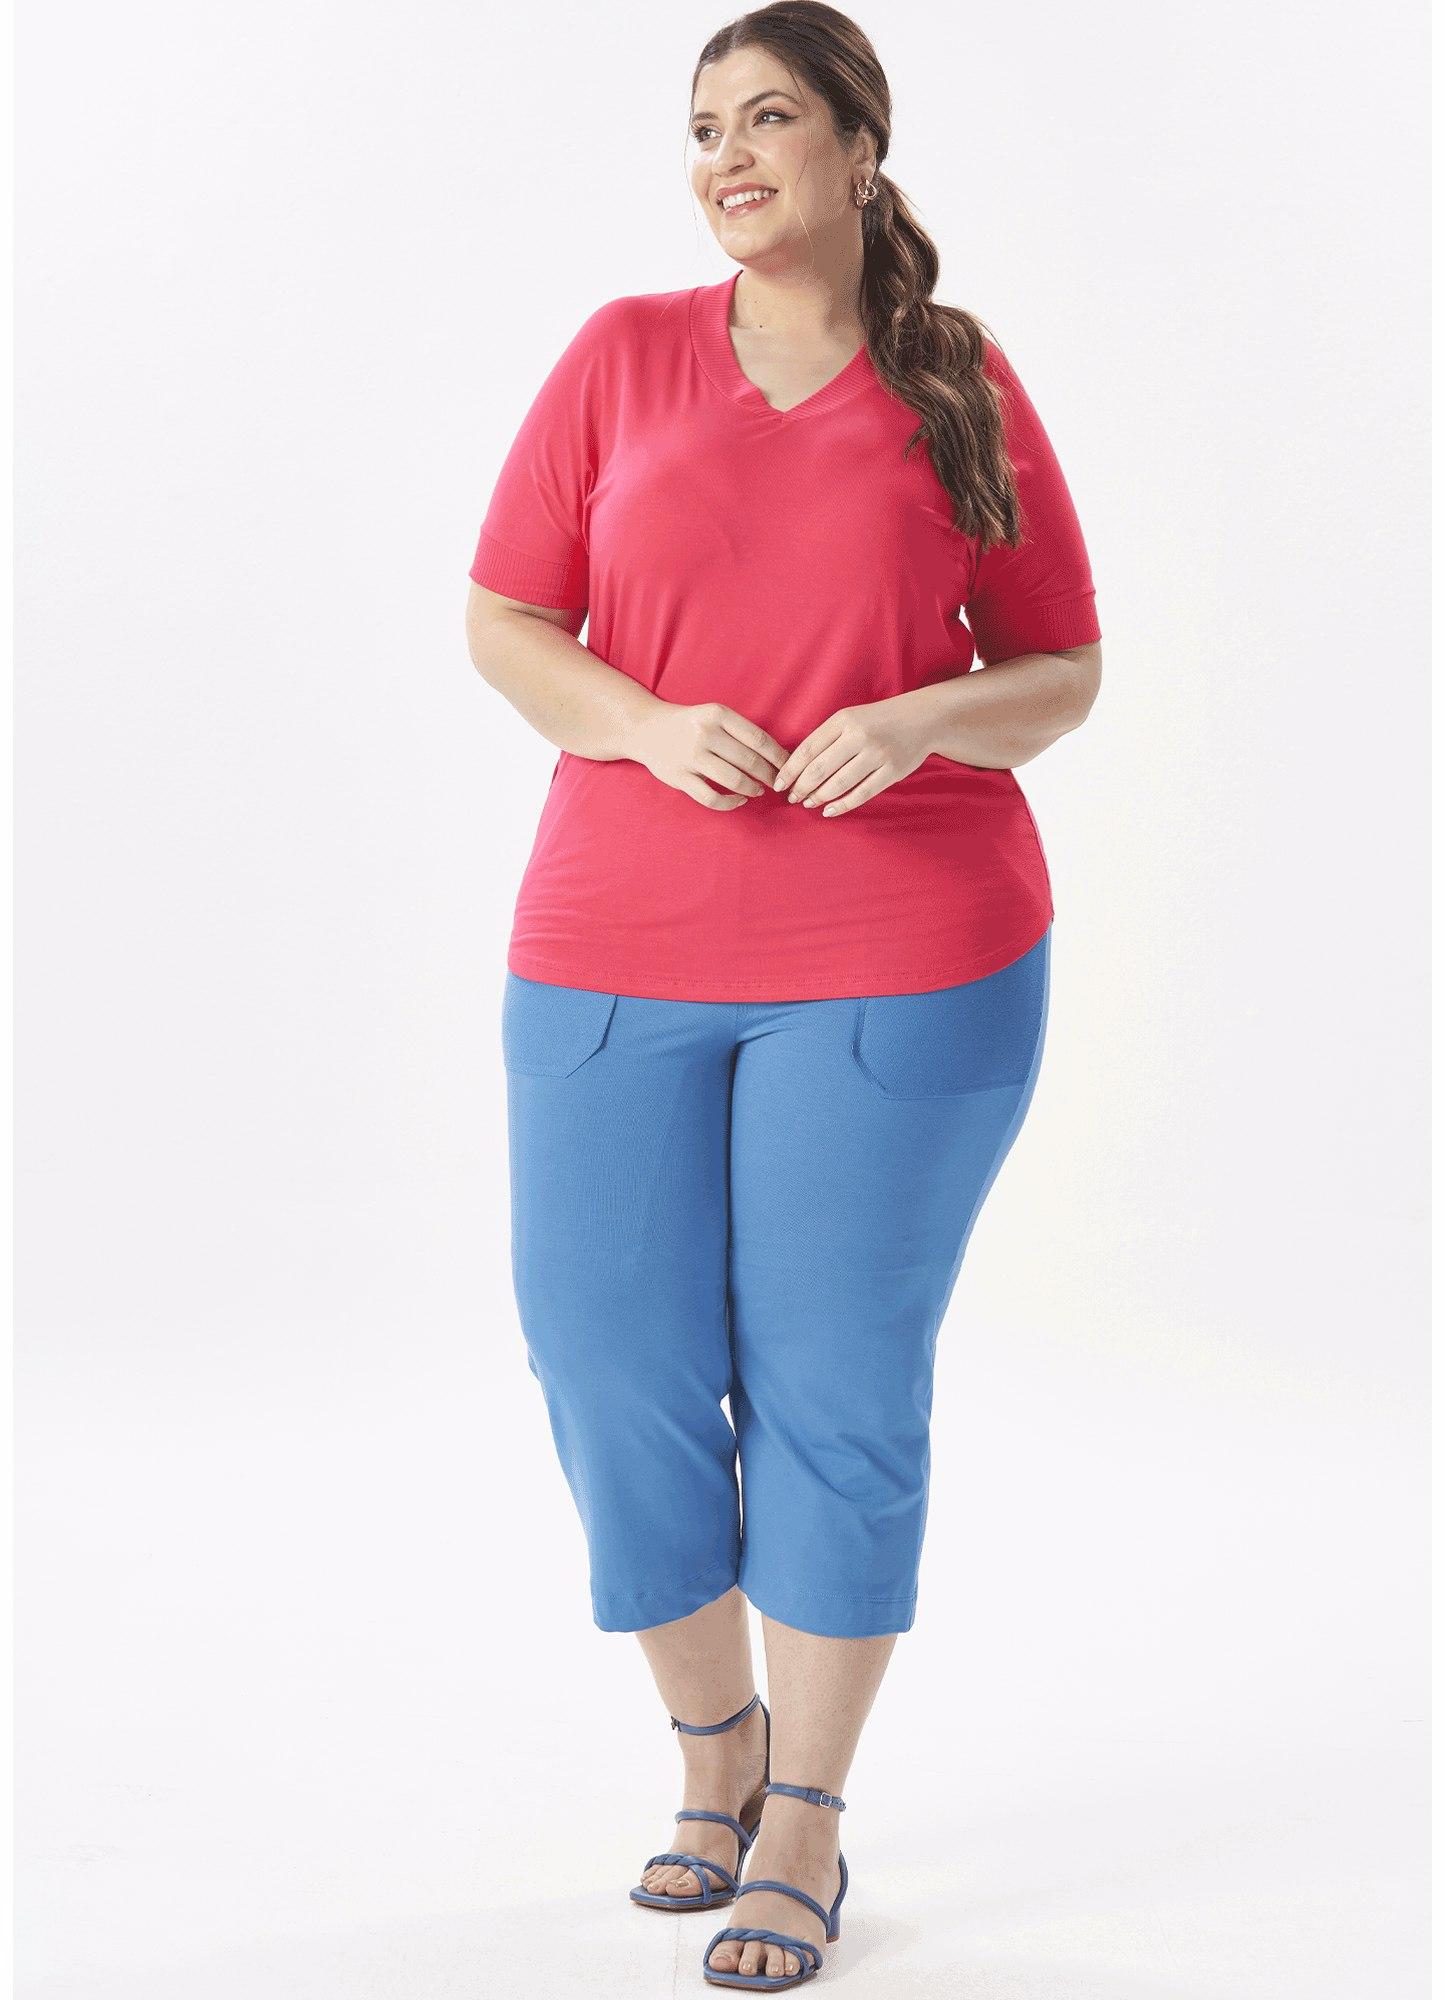 Blusa Feminina Plus Size Detalhe Canelado Mangas e Decote